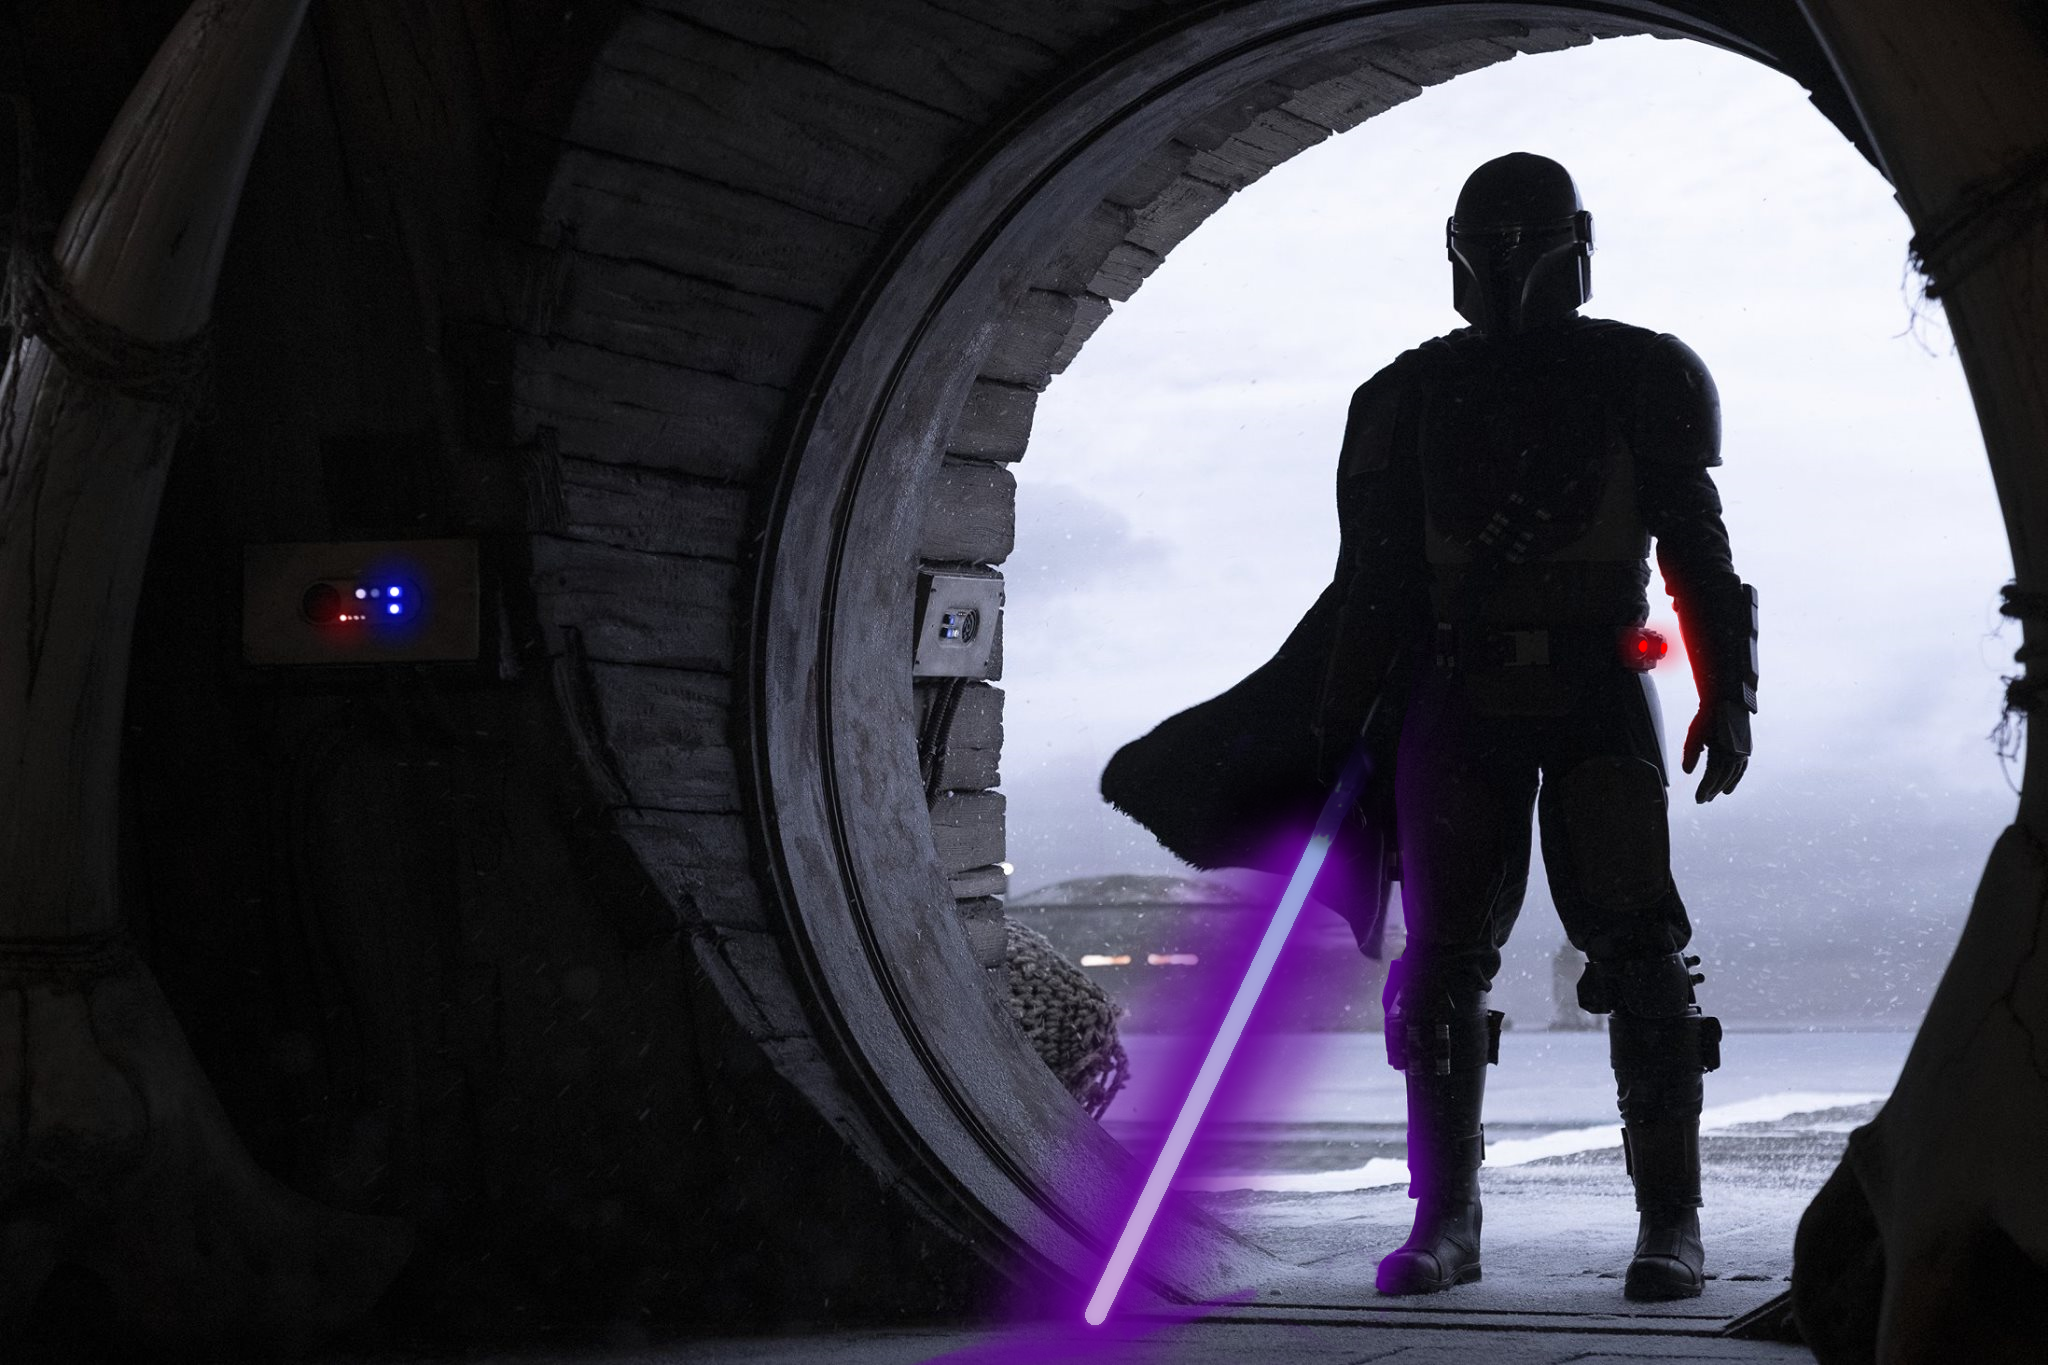 The Mandalorian Star Wars Mandalorians Neon Neon Photo Snow PQnos 2048x1365